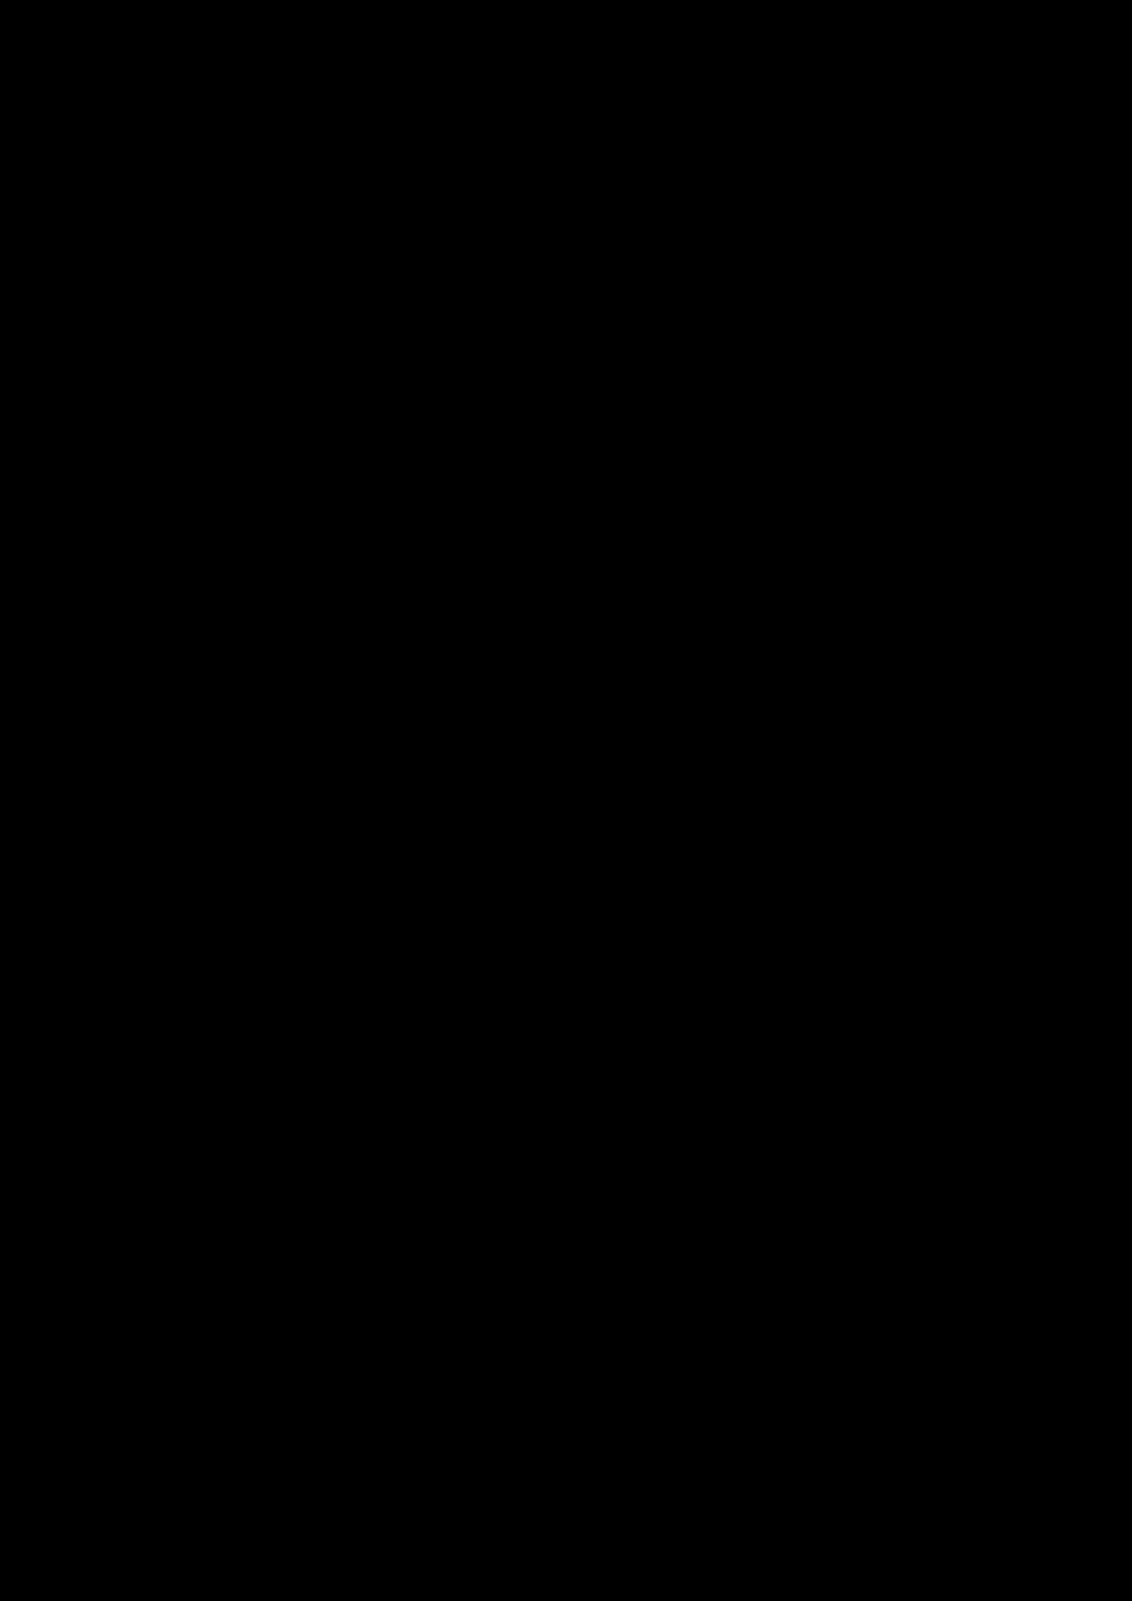 Ten lyubvi slide, Image 1